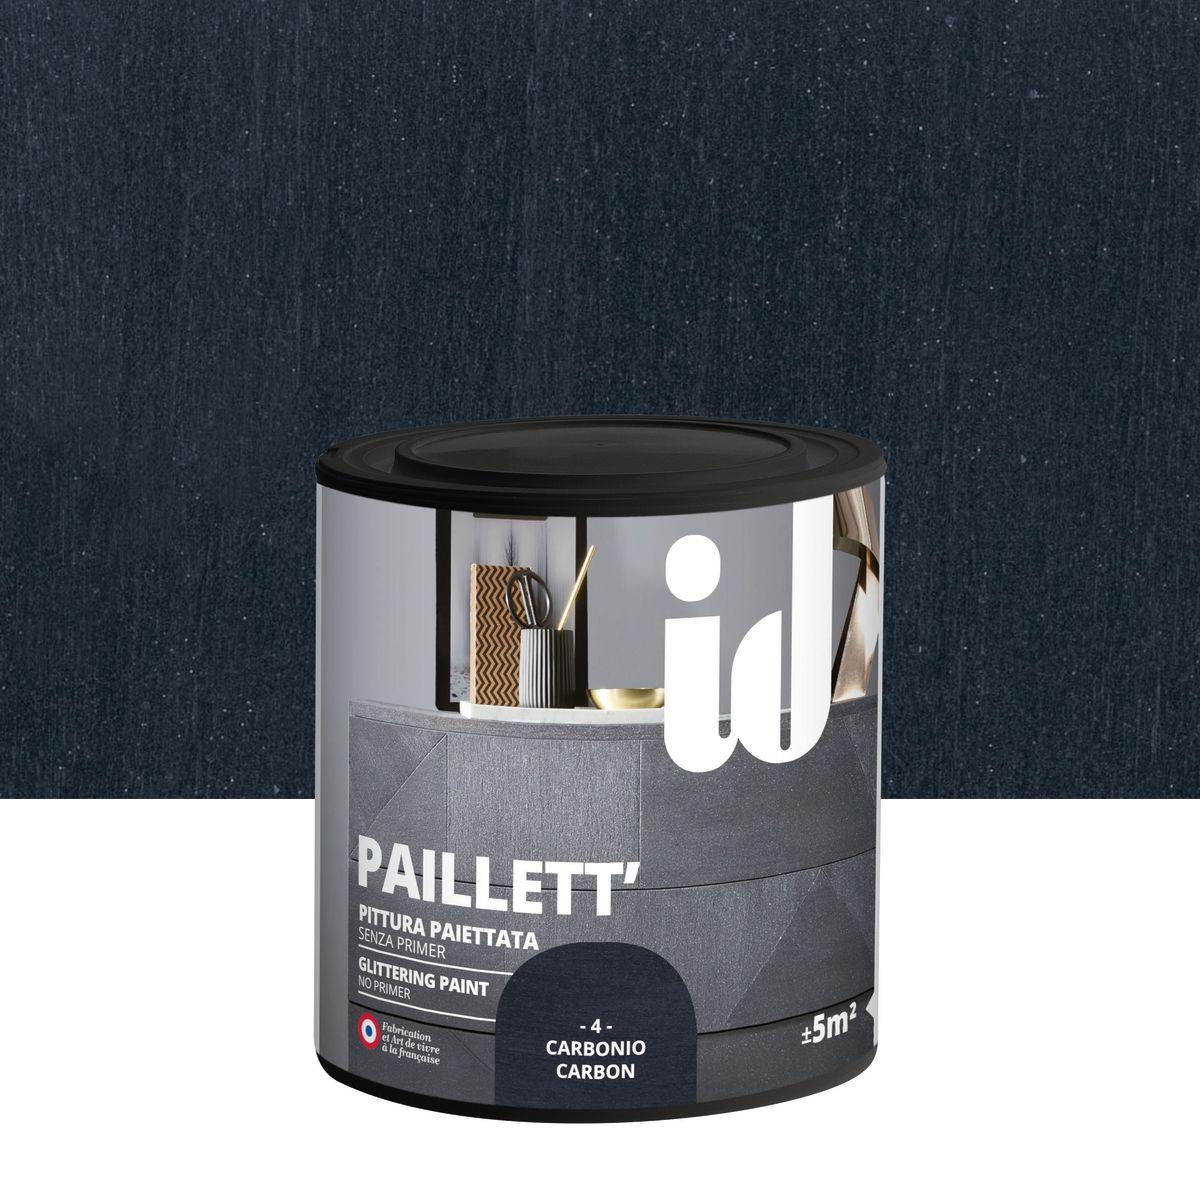 Pittura glitter leroy merlin paint elegance with pittura for Leroy merlin pittura pareti